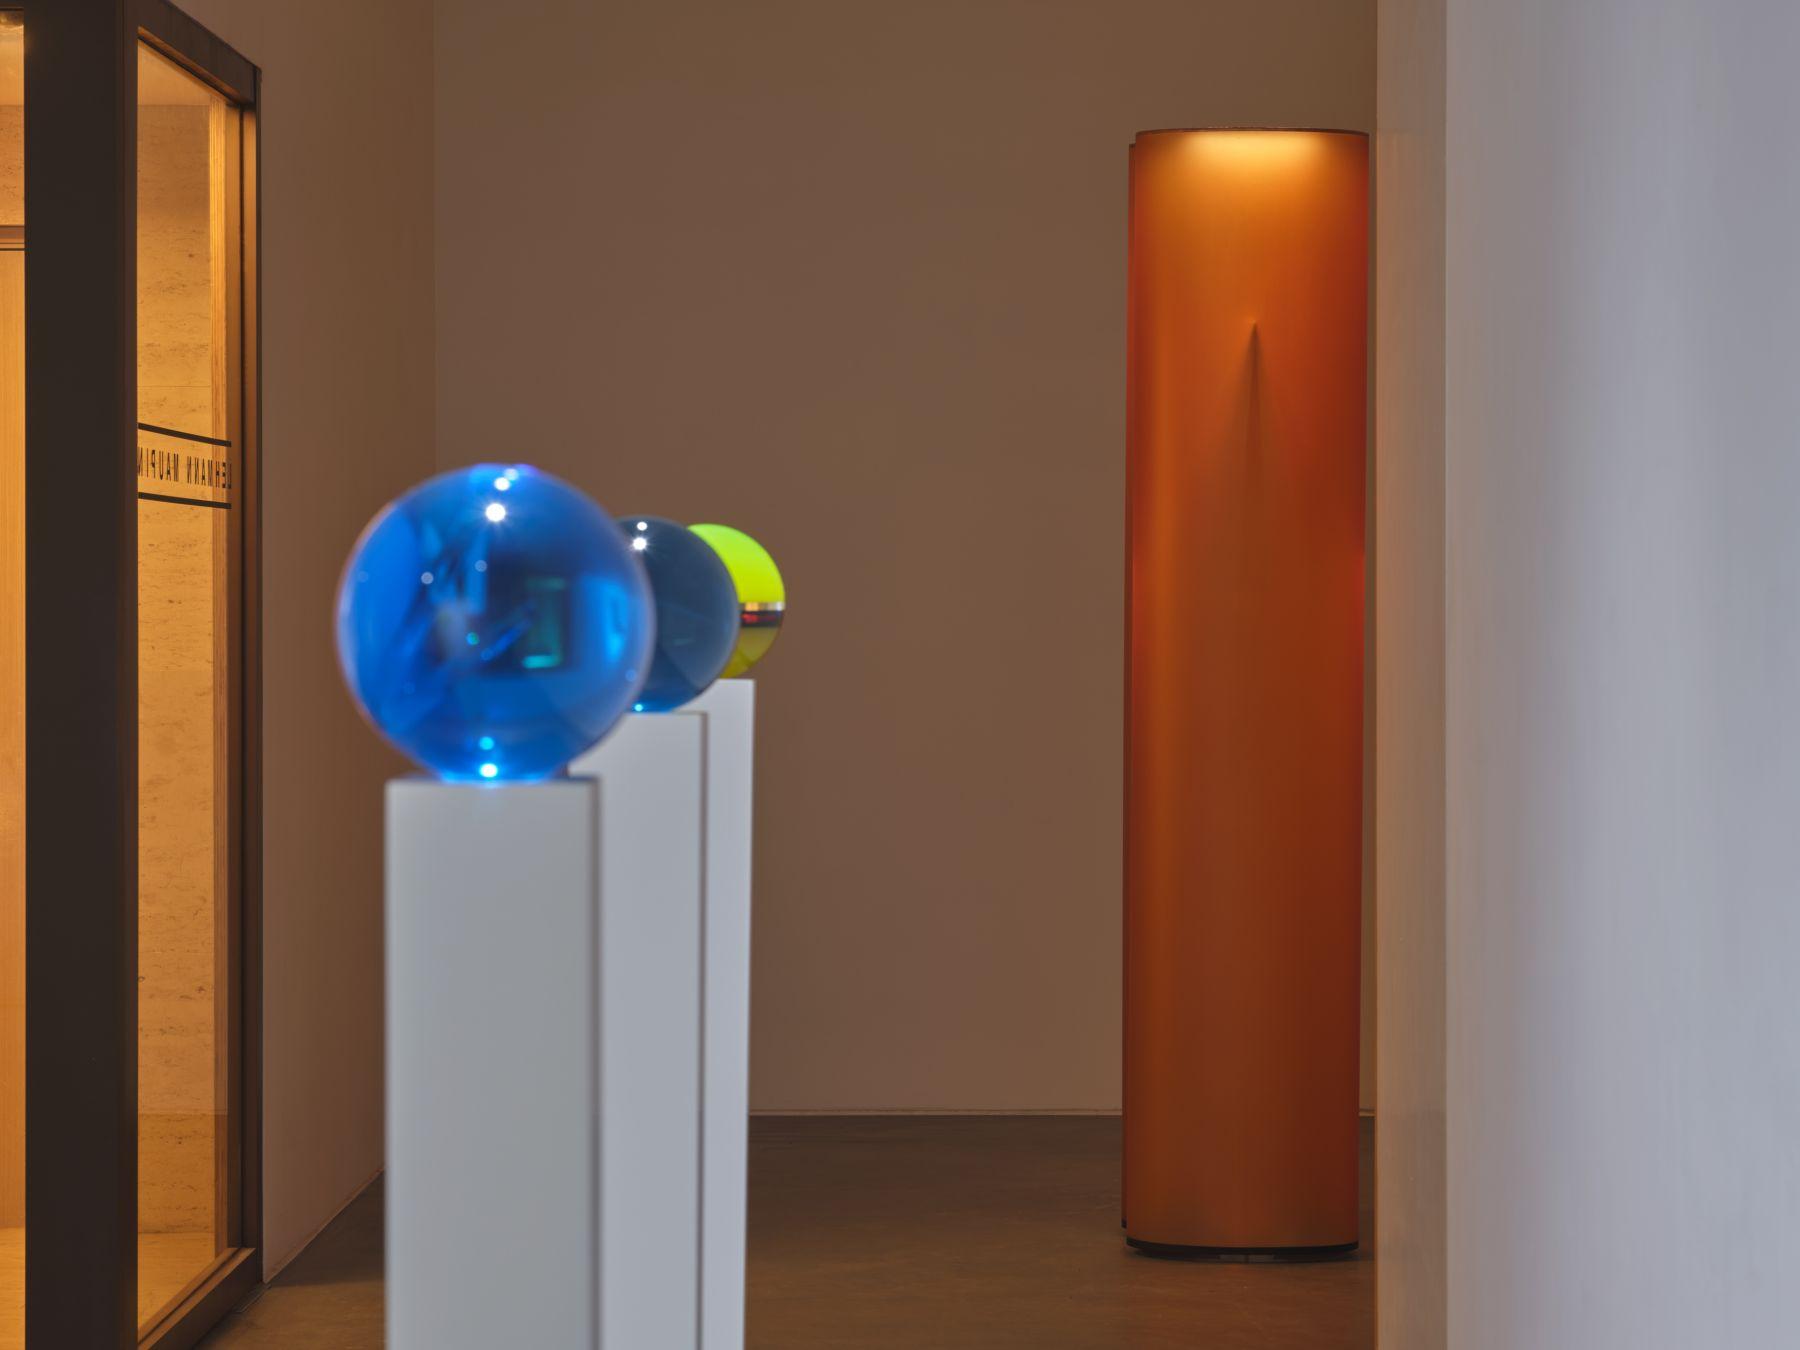 Helen Pashgian, Installation view, Lehmann Maupin, Hong Kong, 2019–2020